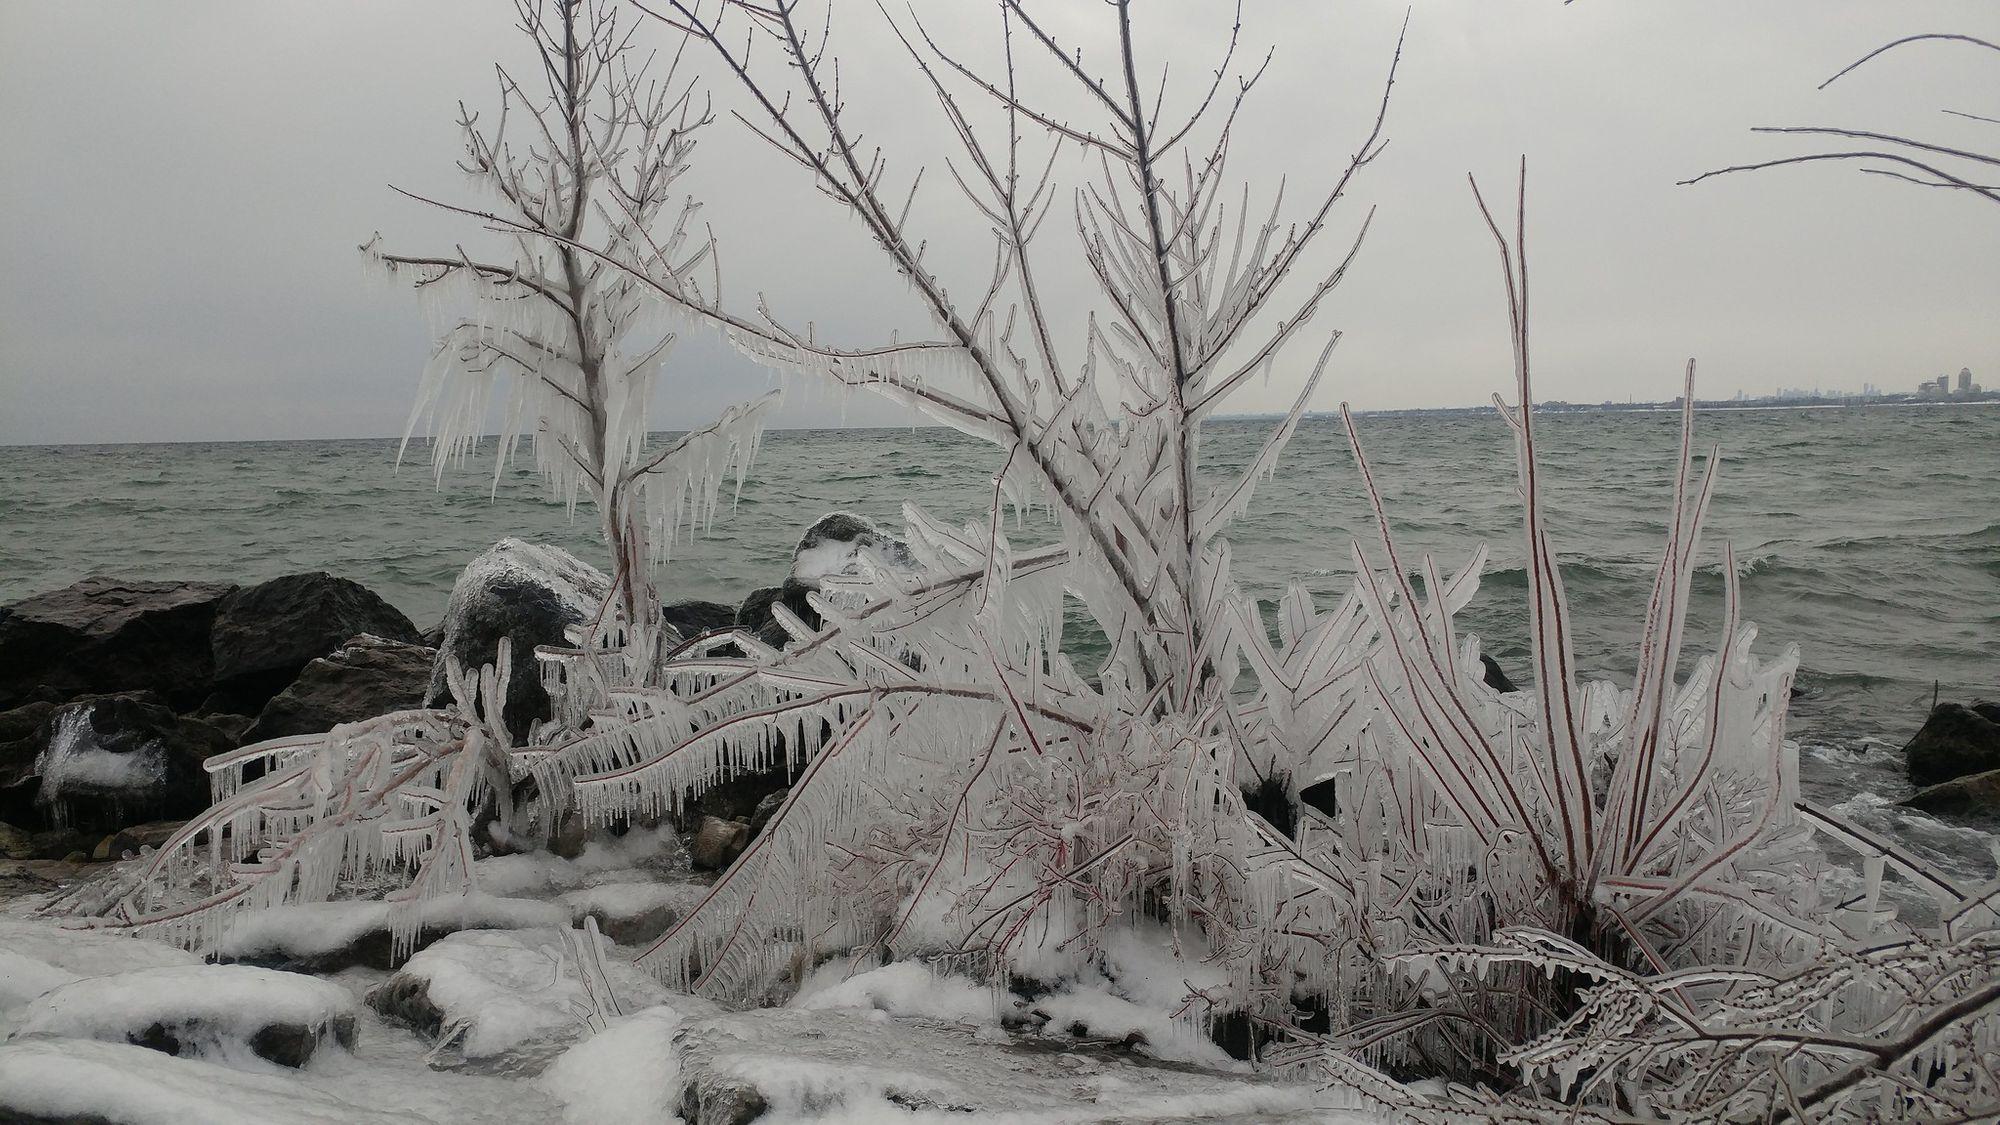 Winter Ride to Ontario Place